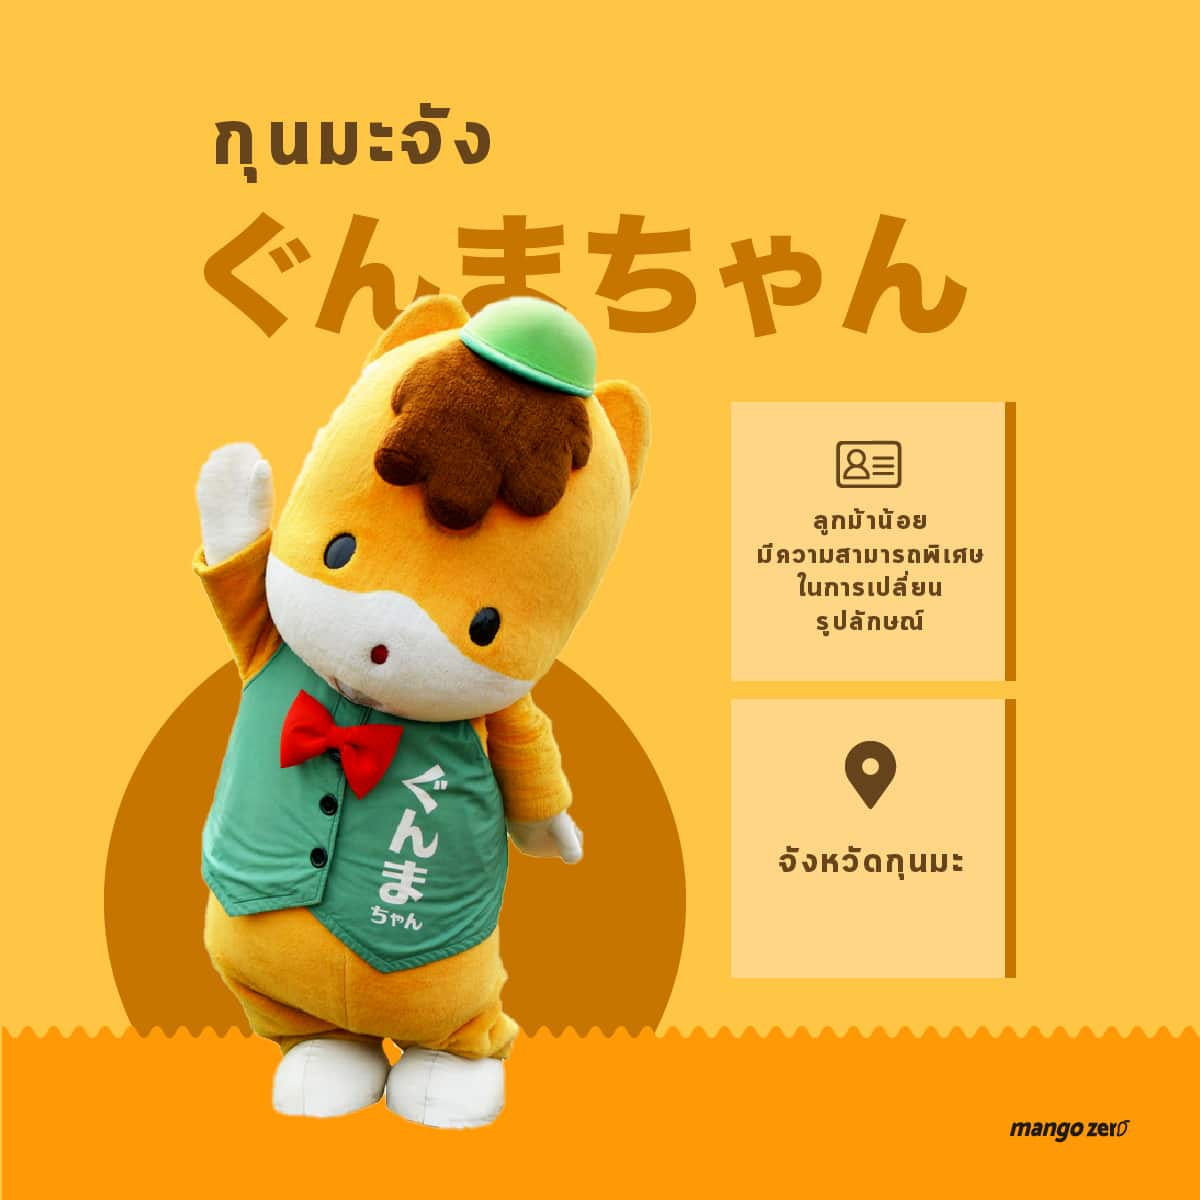 8-cute-mascots-in-japan-10-07